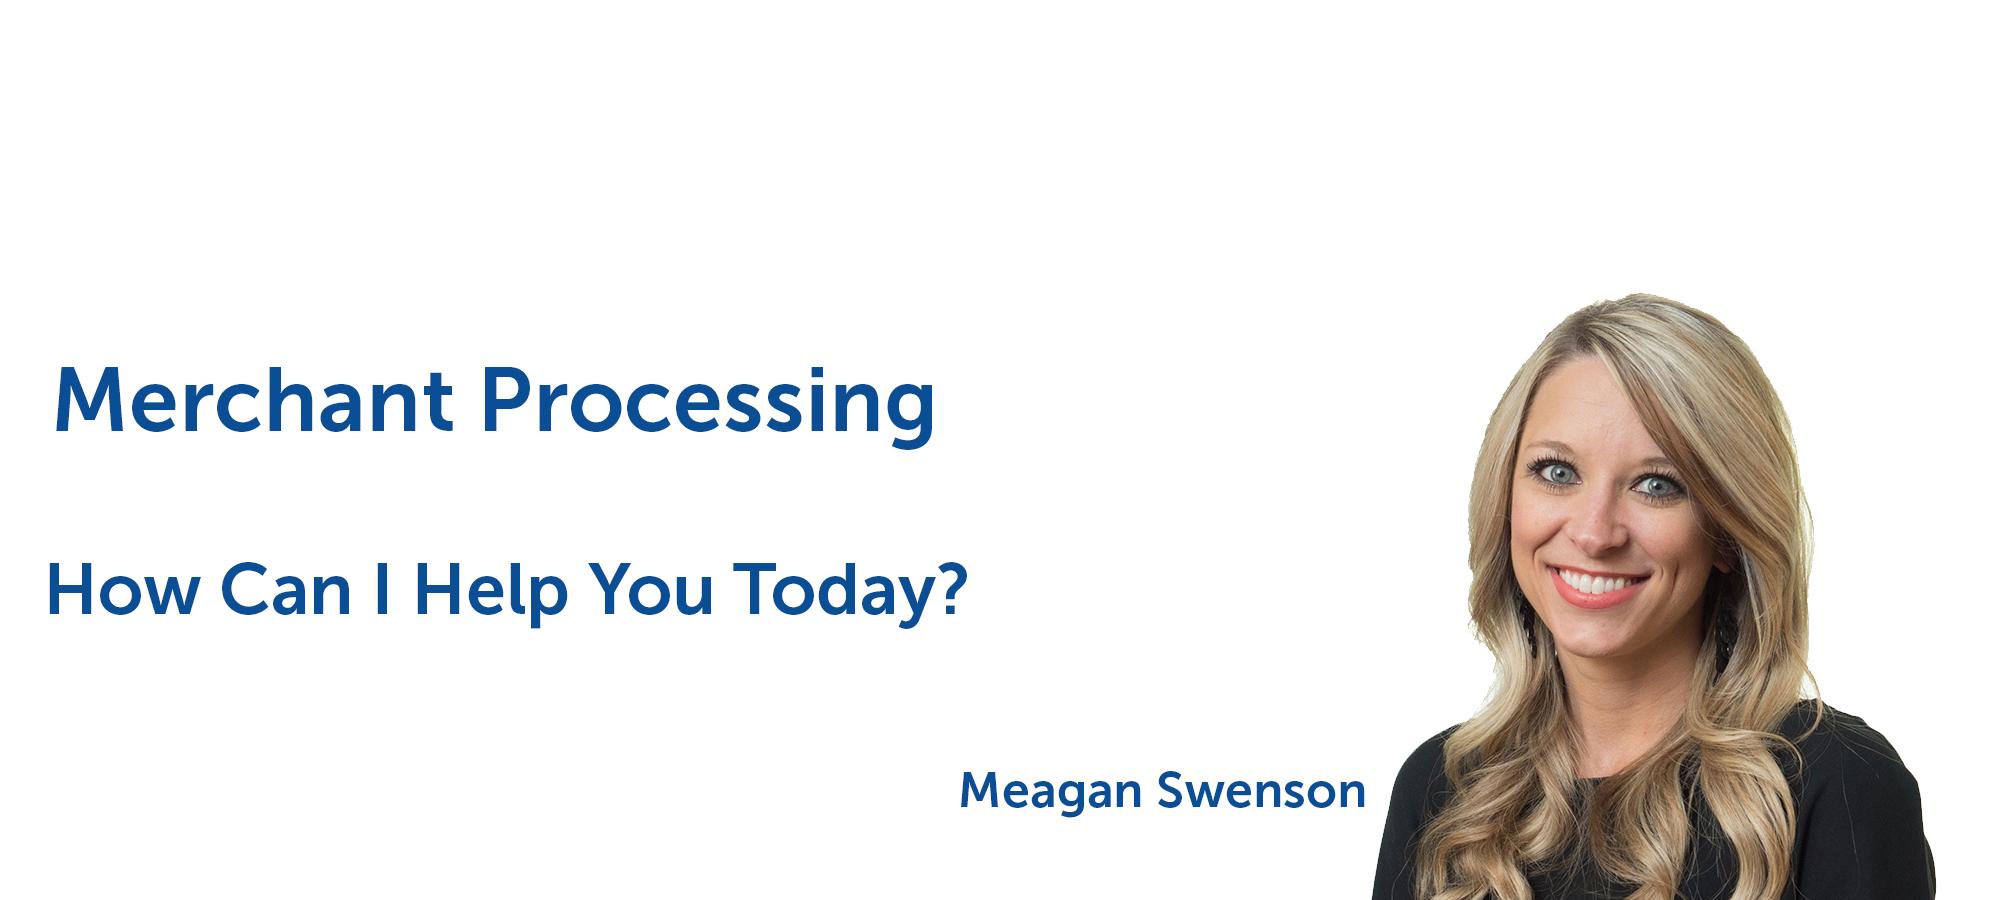 Meagan Swenson smiling